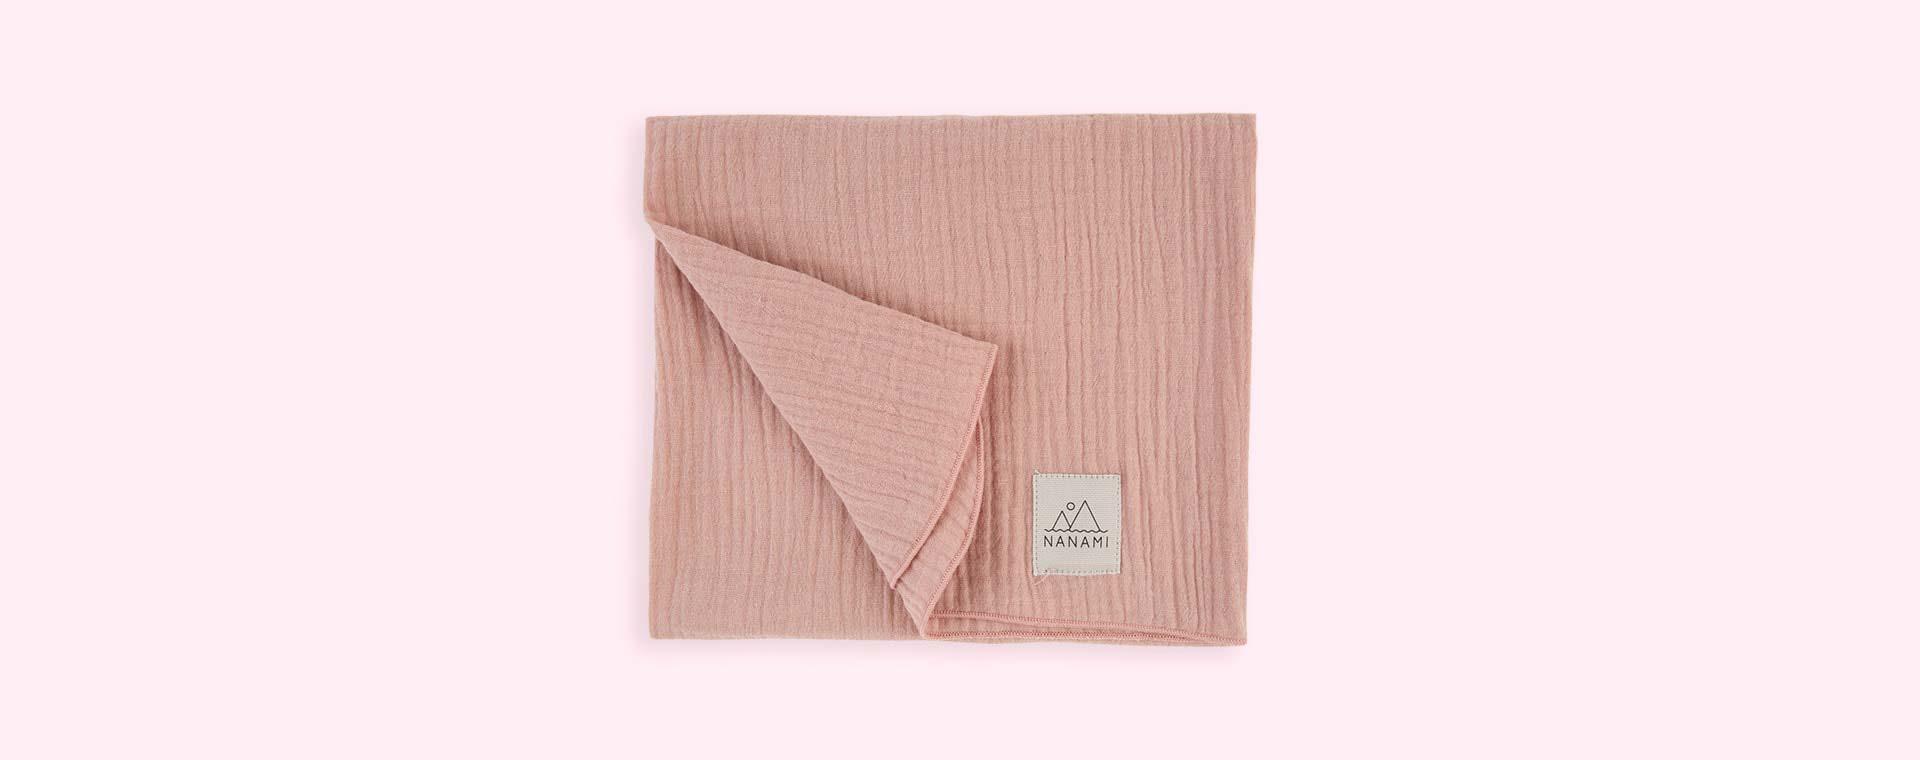 Dusty Pink Nanami Muslin Square